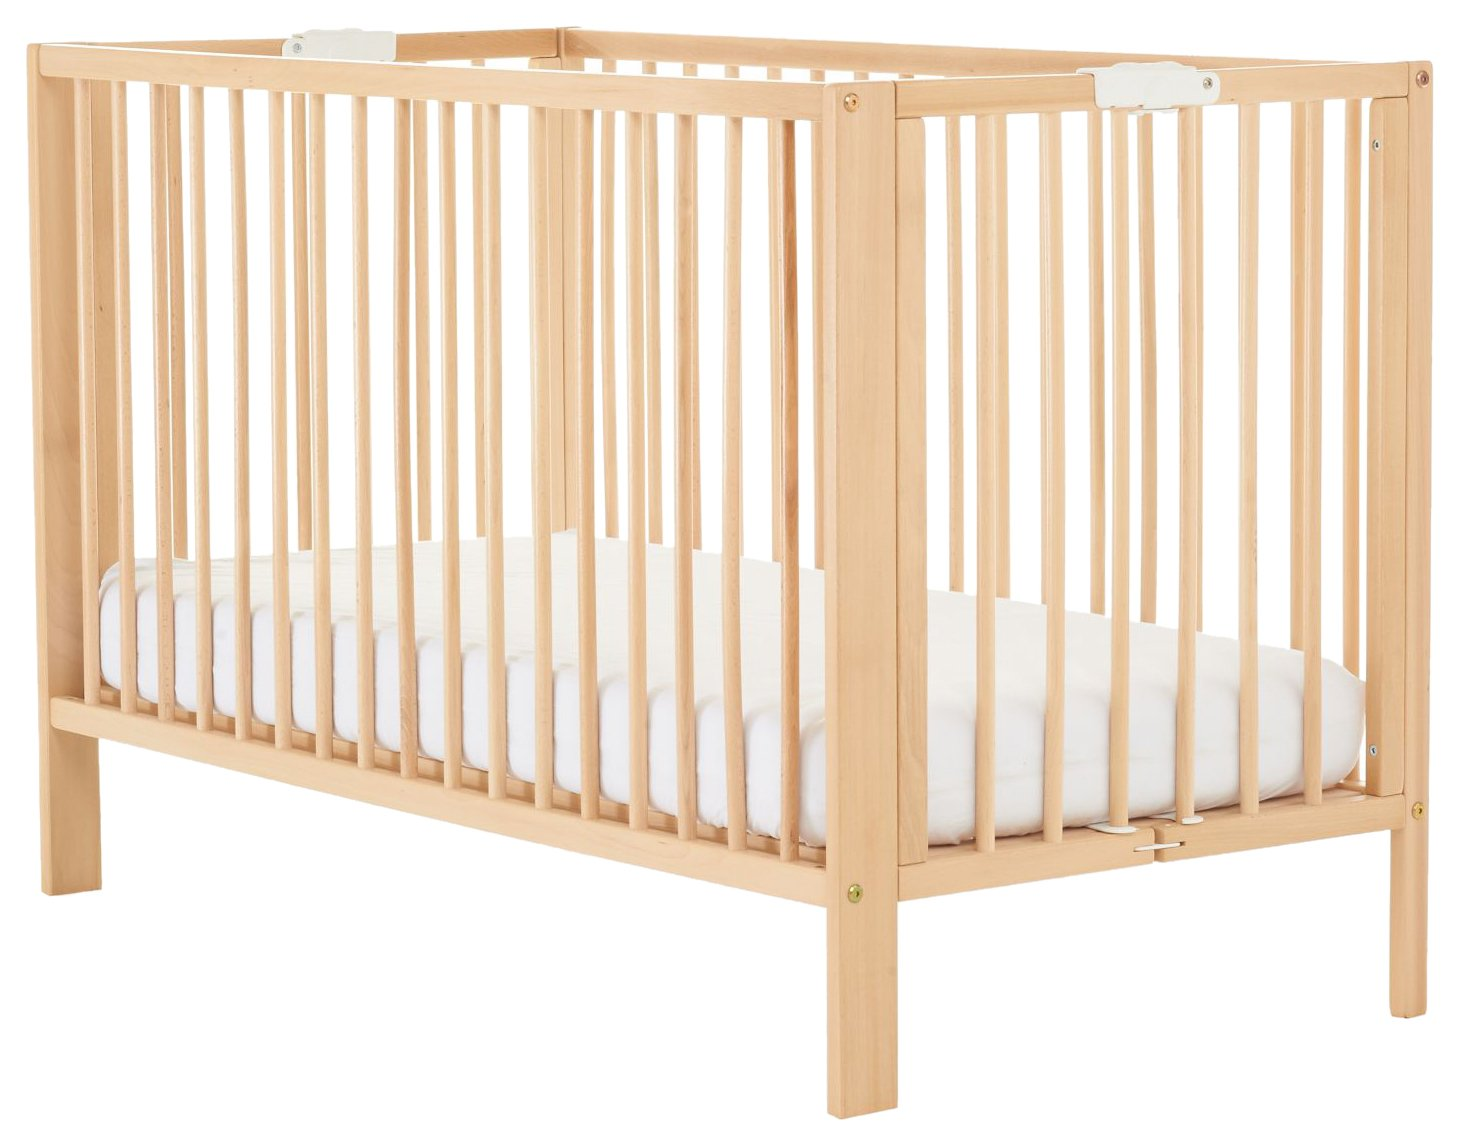 Mothercare Folding Cot, Beech 243085